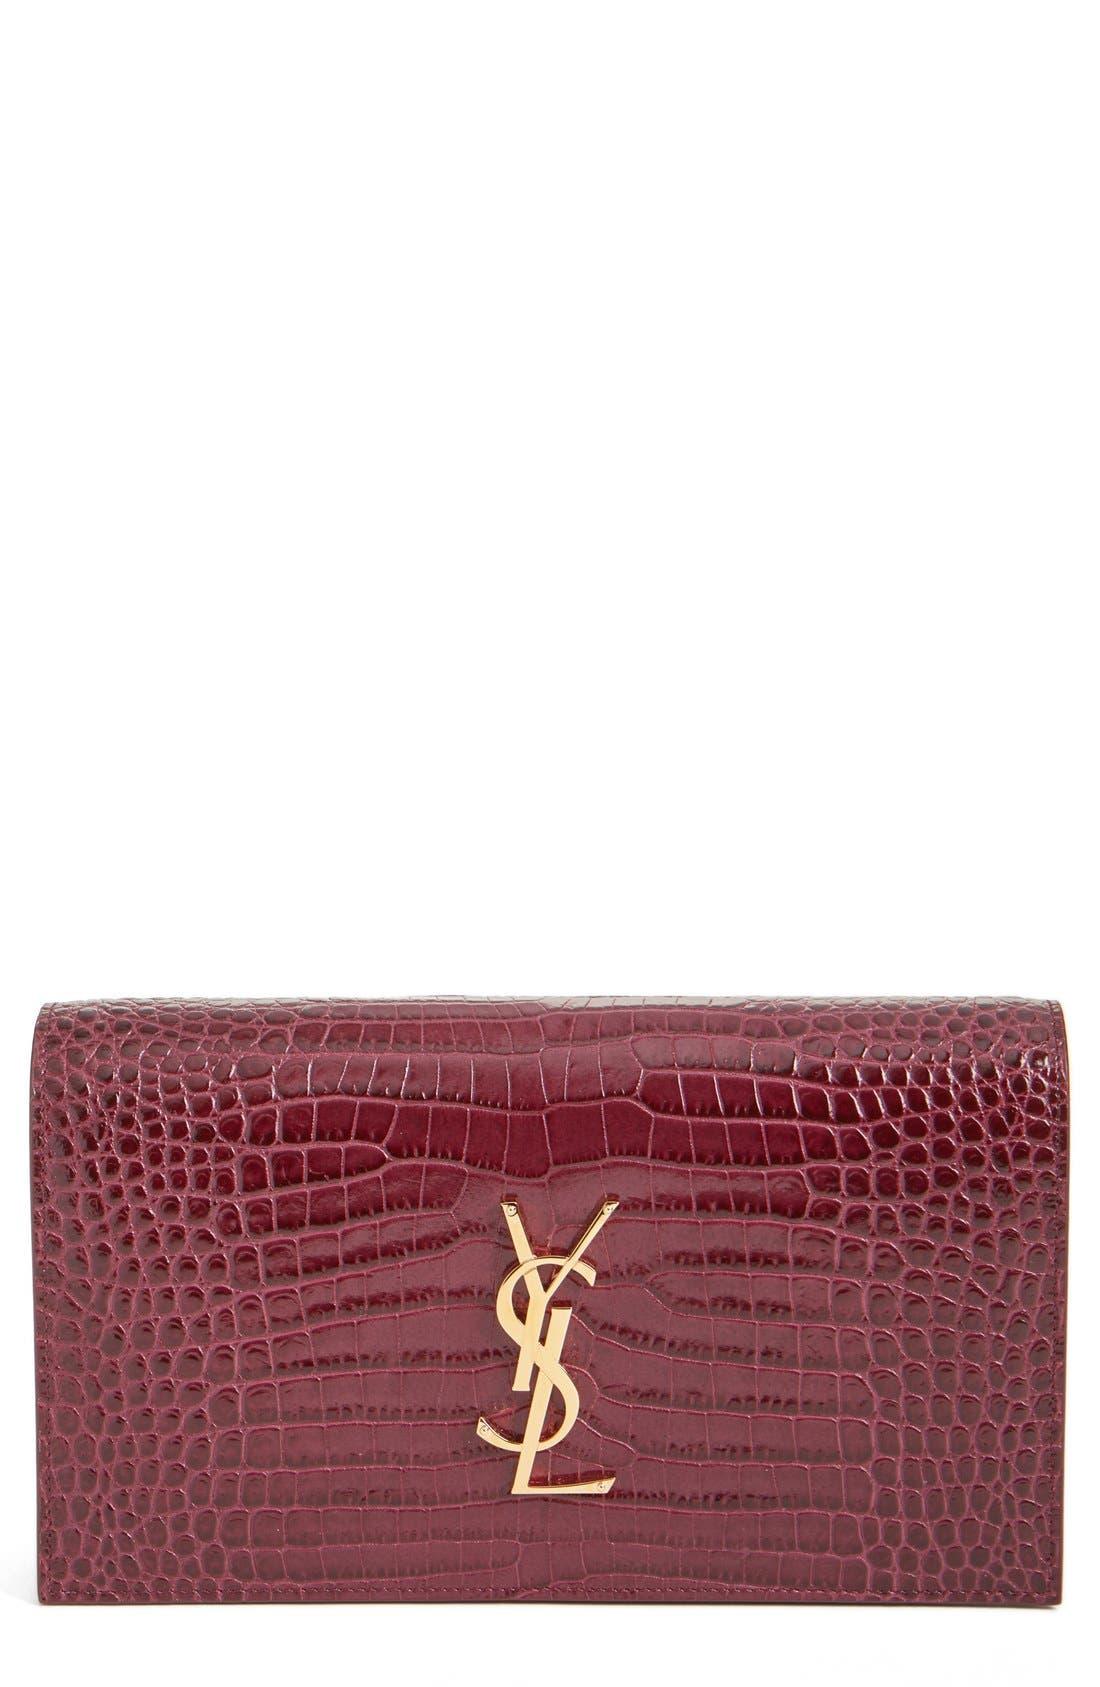 Main Image - Saint Laurent 'Kate' Croc Embossed Calfskin Leather Clutch